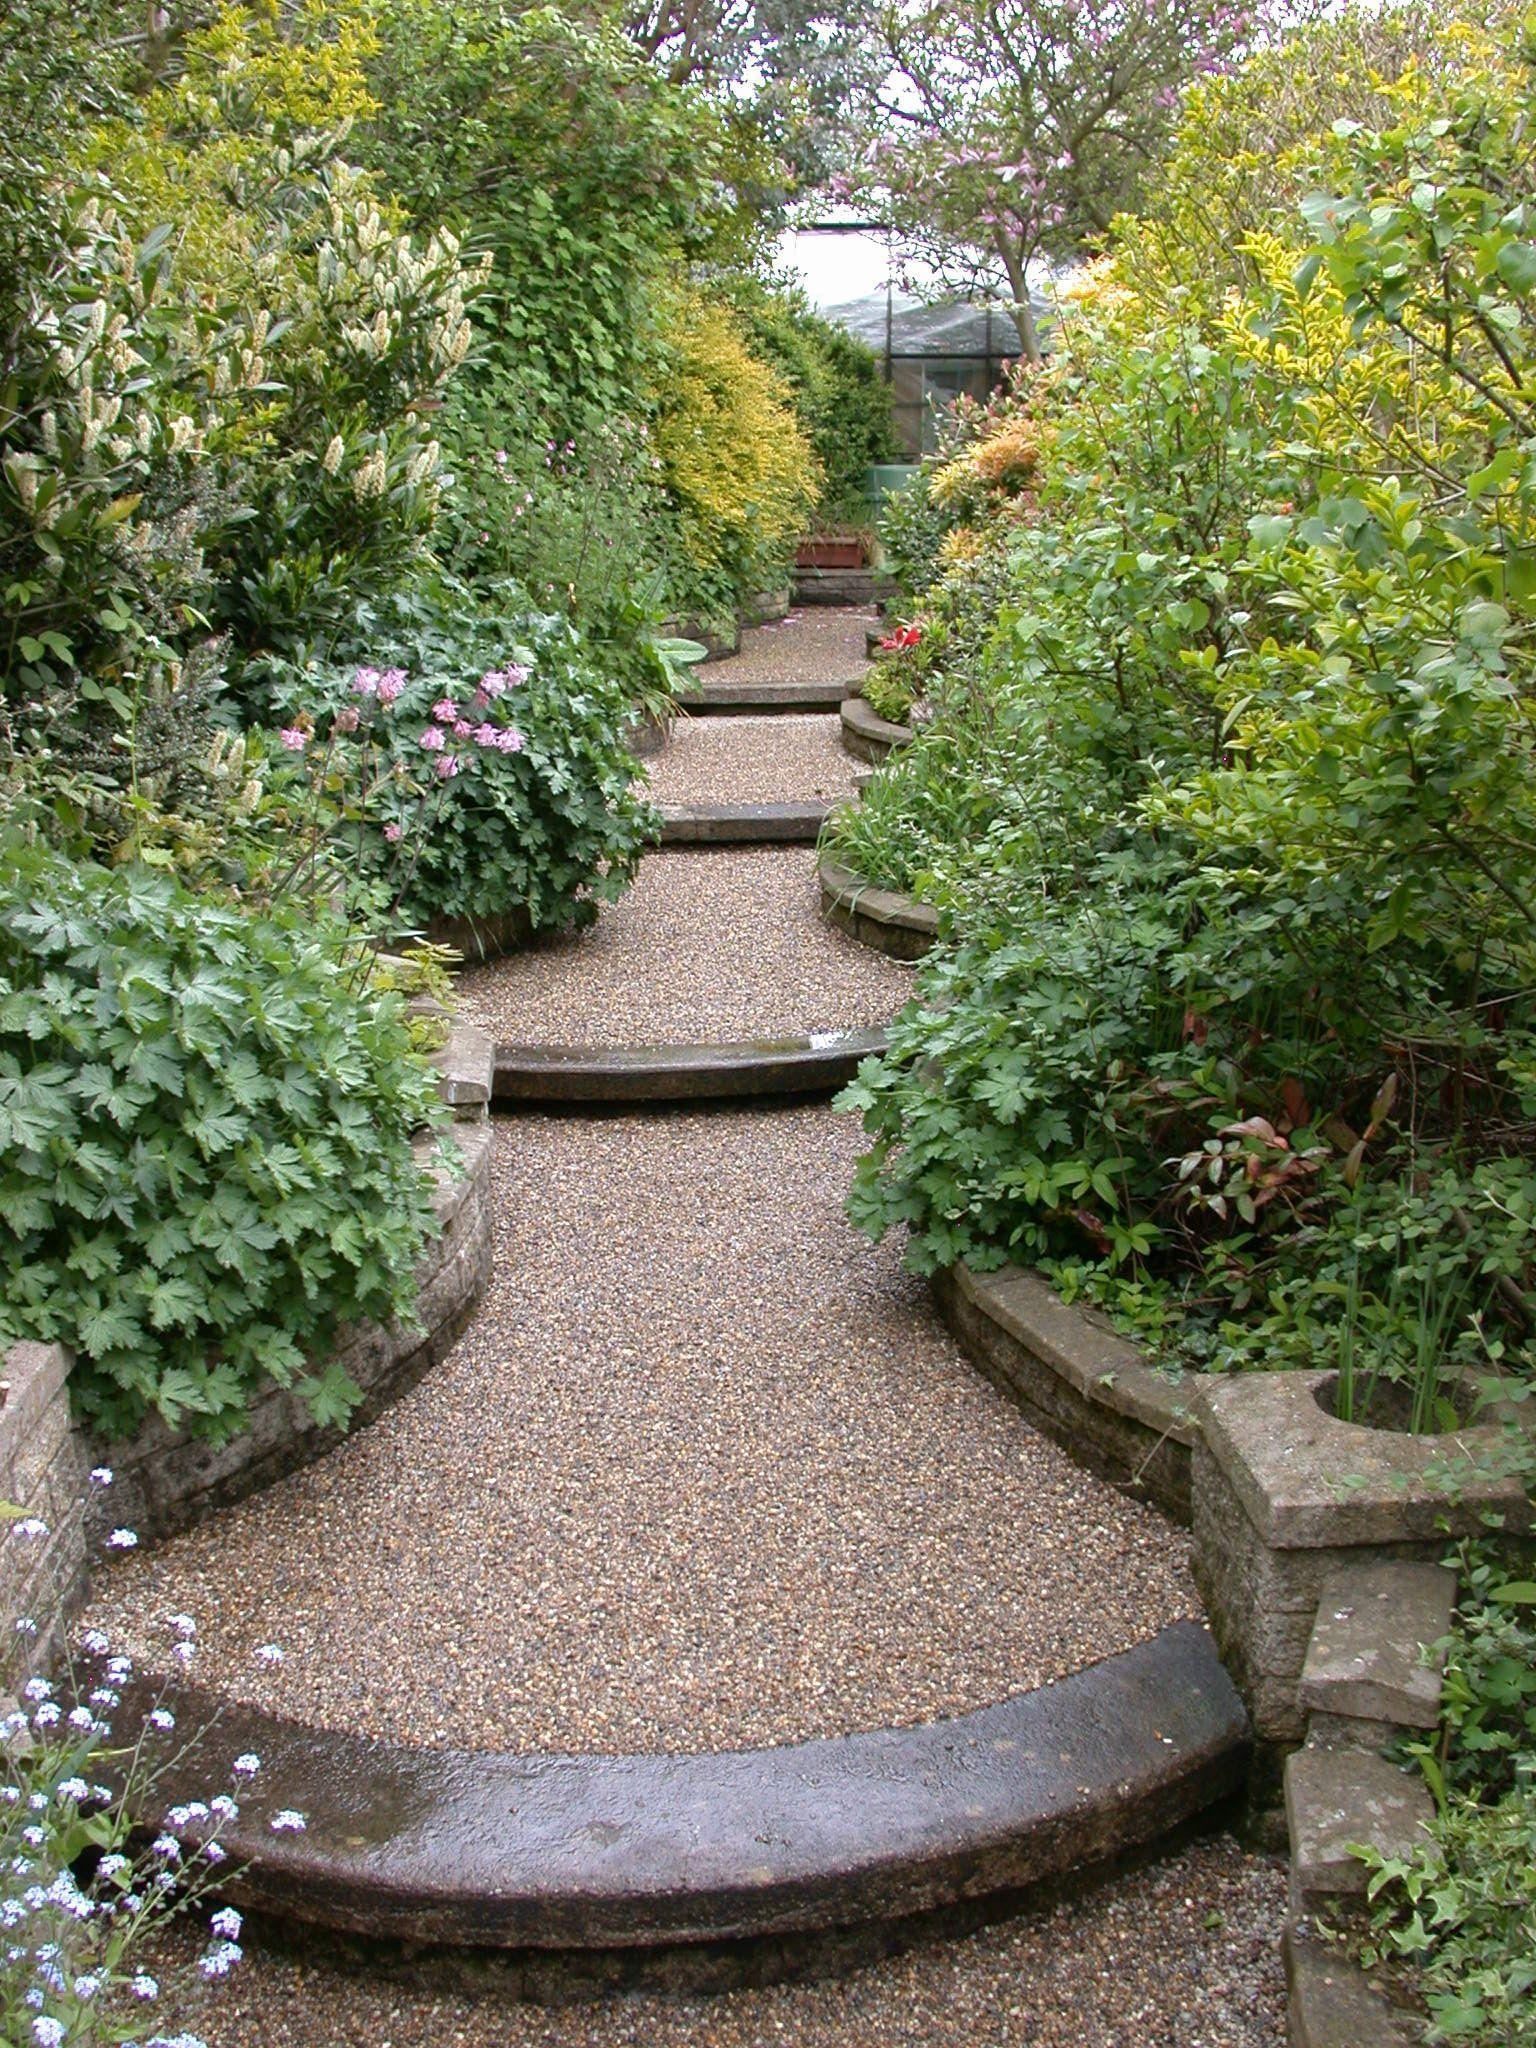 Resin Bonded Garden Path With Detailed Edging Sloped Garden Country Garden Landscaping Garden Paths